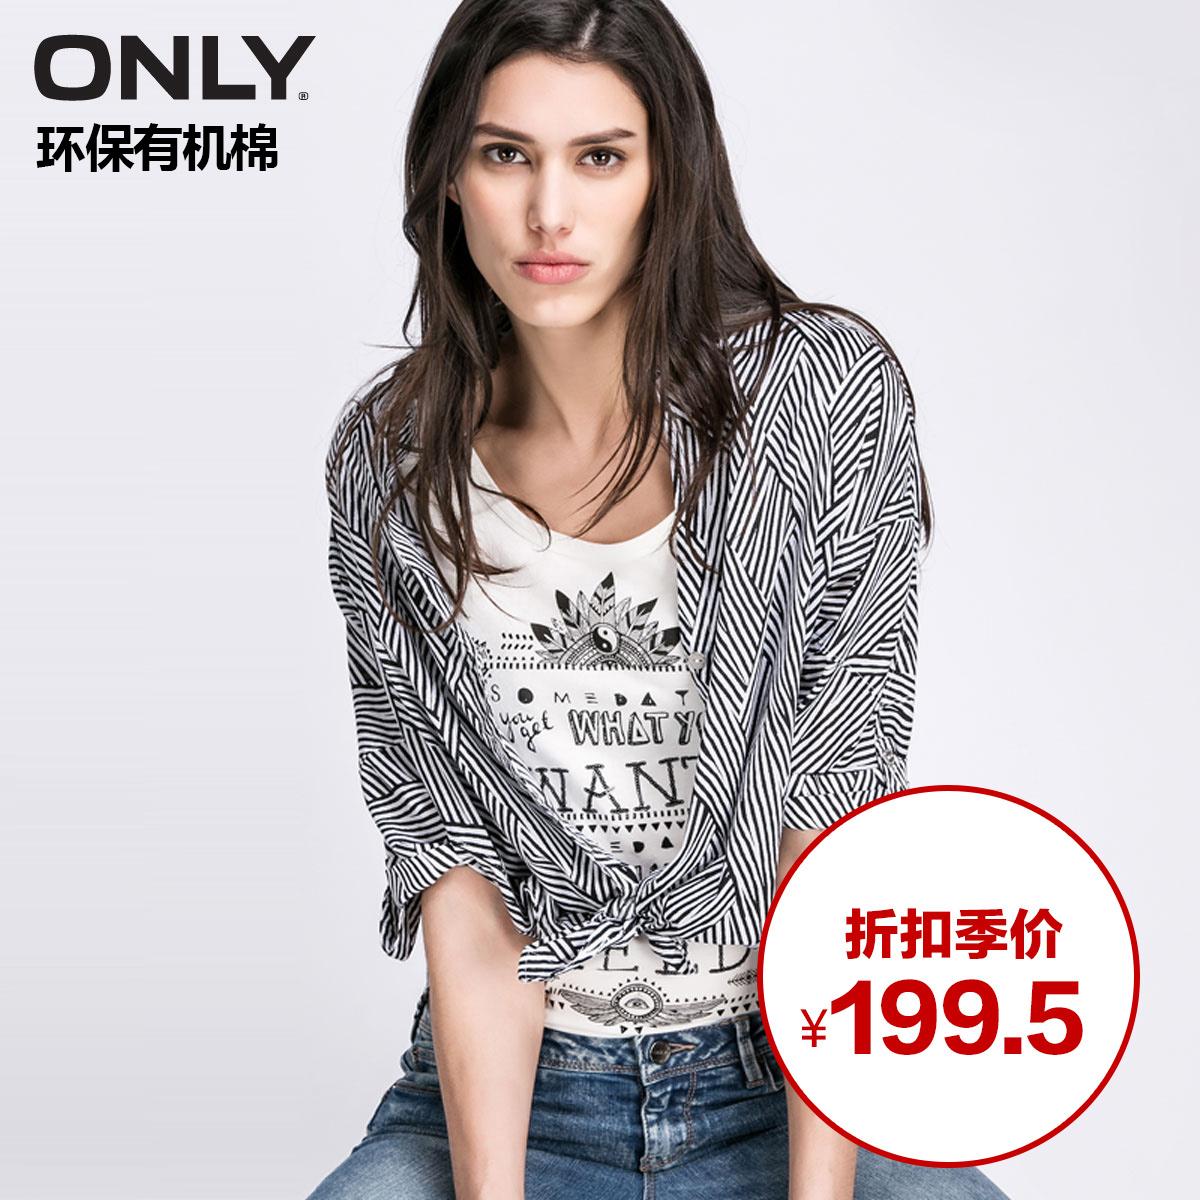 женская рубашка ONLY 115231016 199.5